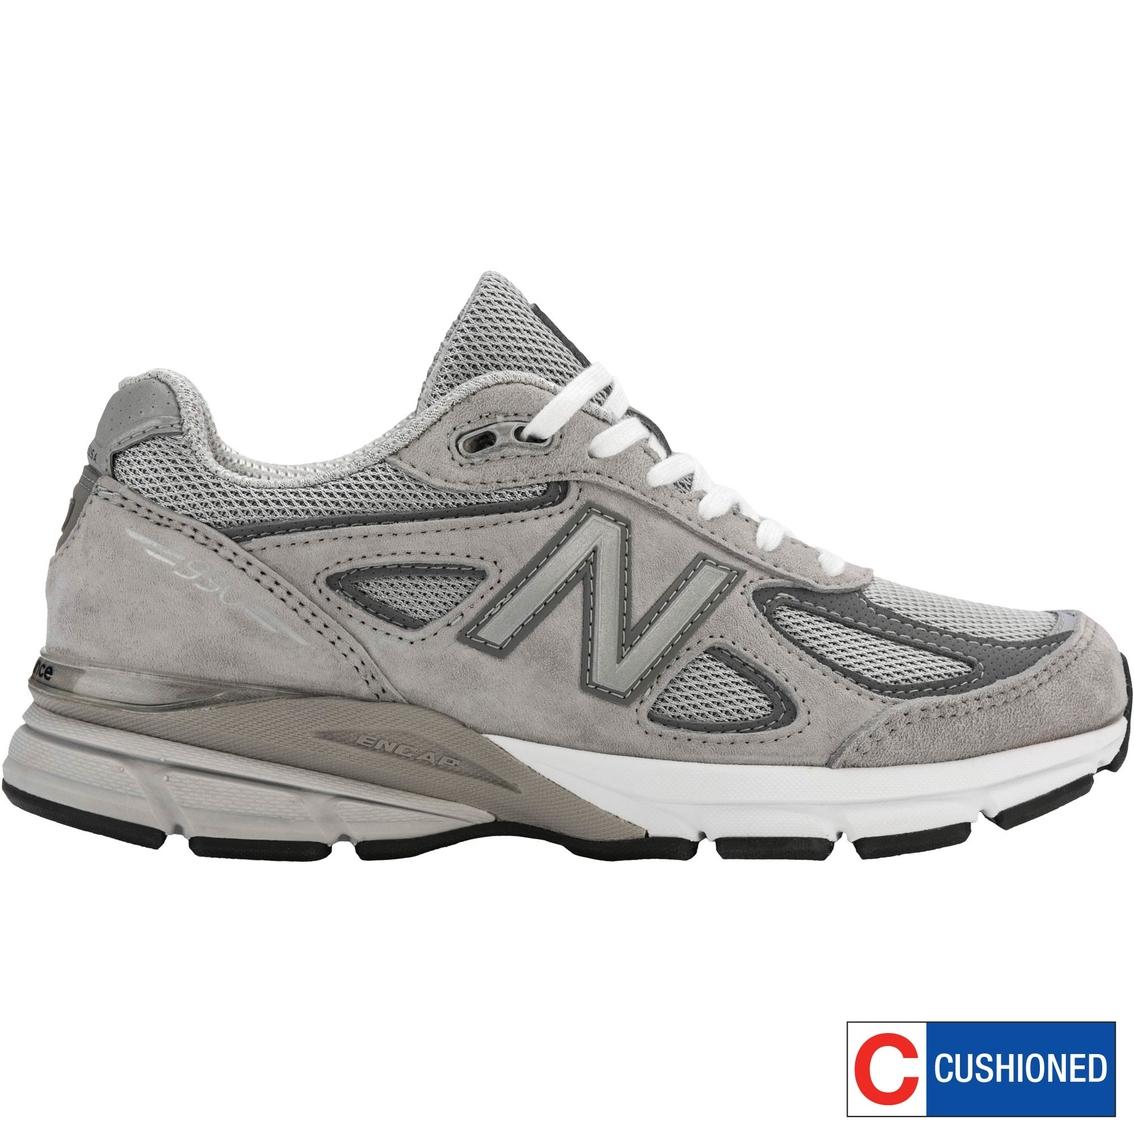 3e97f2bac1 New Balance Womens W990gl4 Running Shoes | Running | Back To School ...